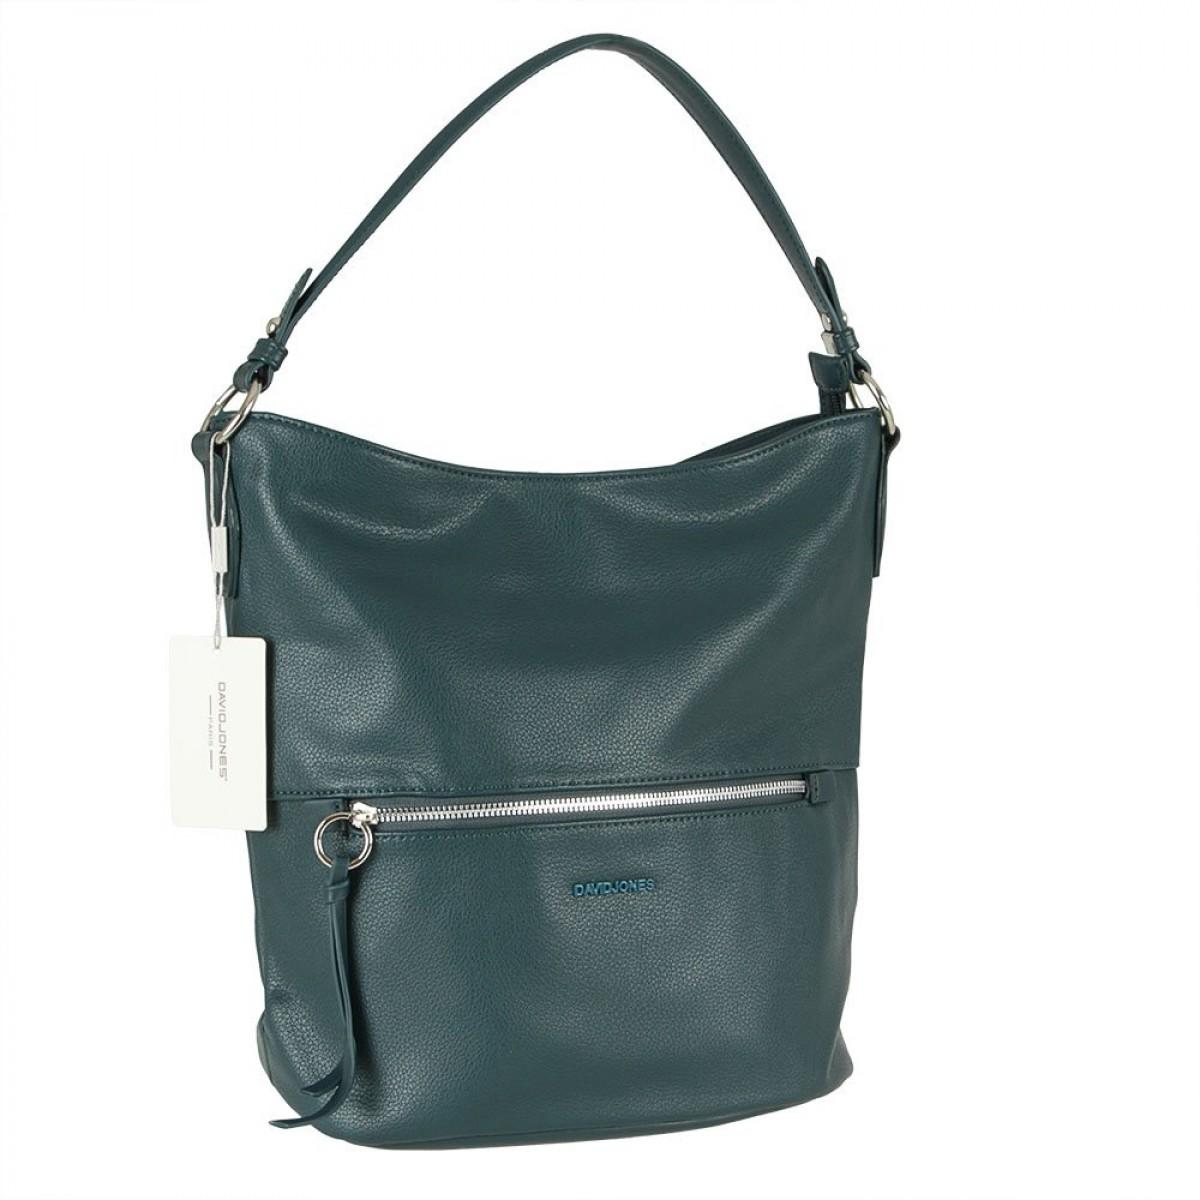 Жіноча сумка David Jones 6422-1 PEACOCK BLUE